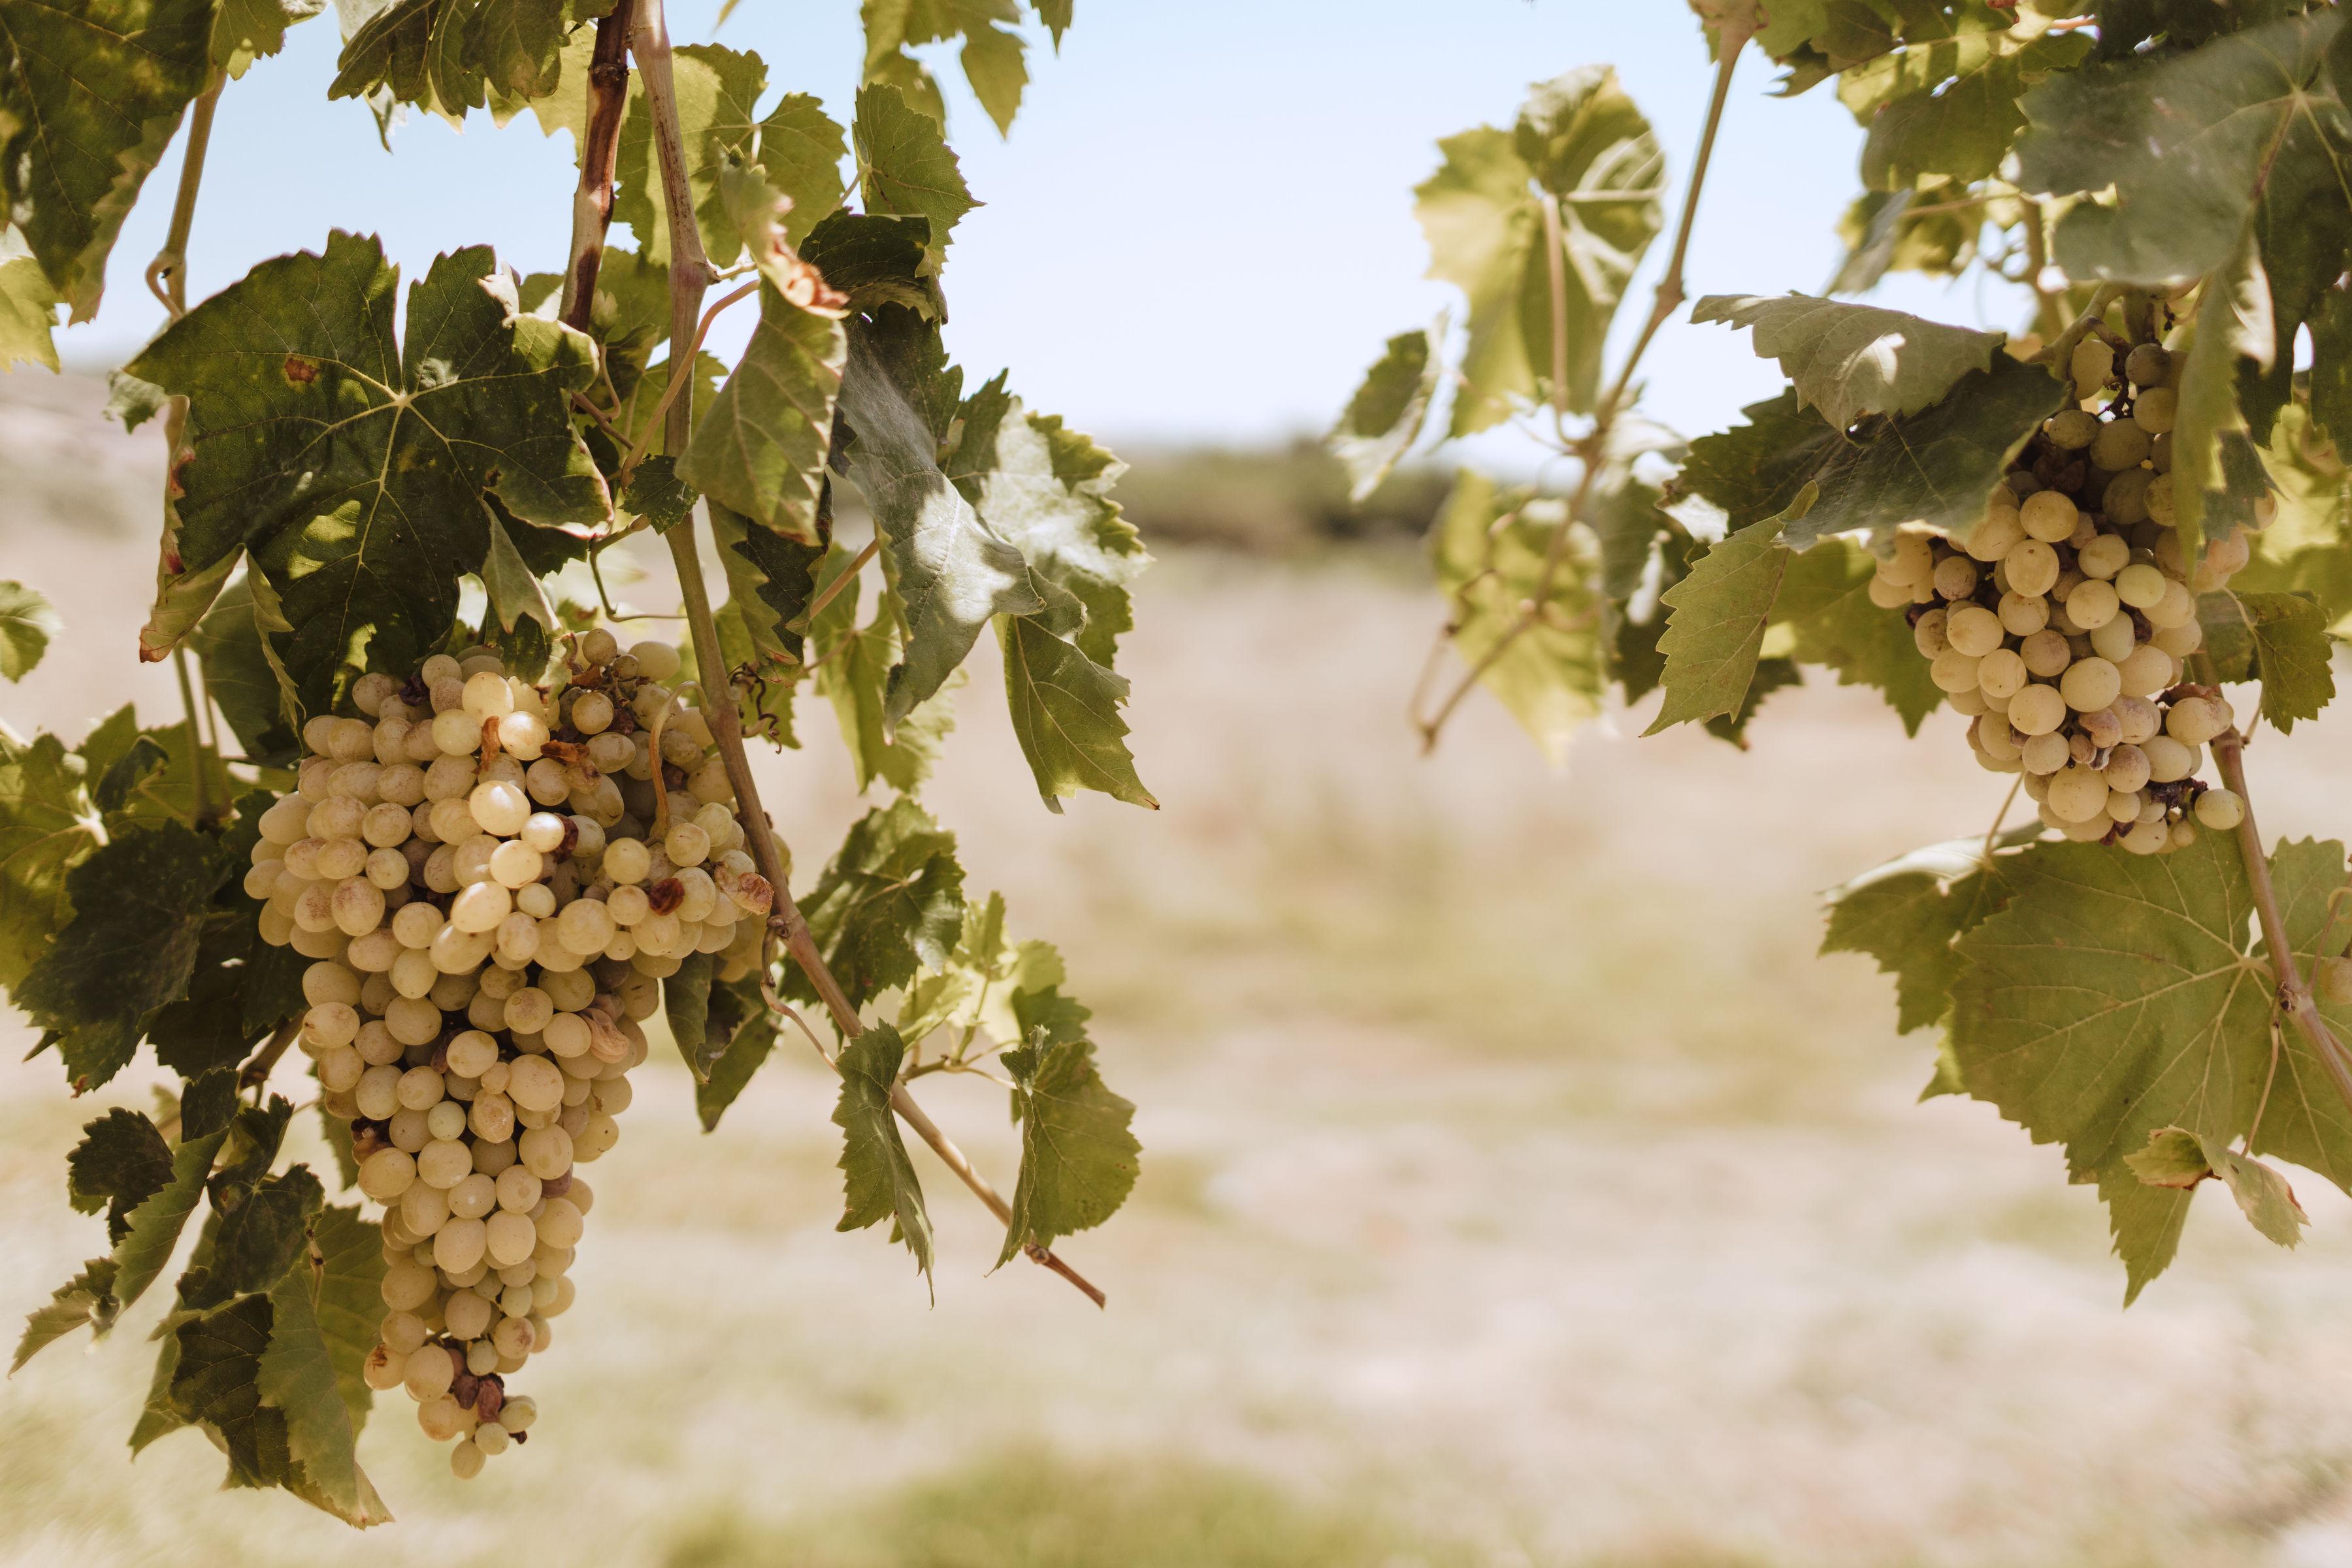 Grapevines in Zeytinköy.